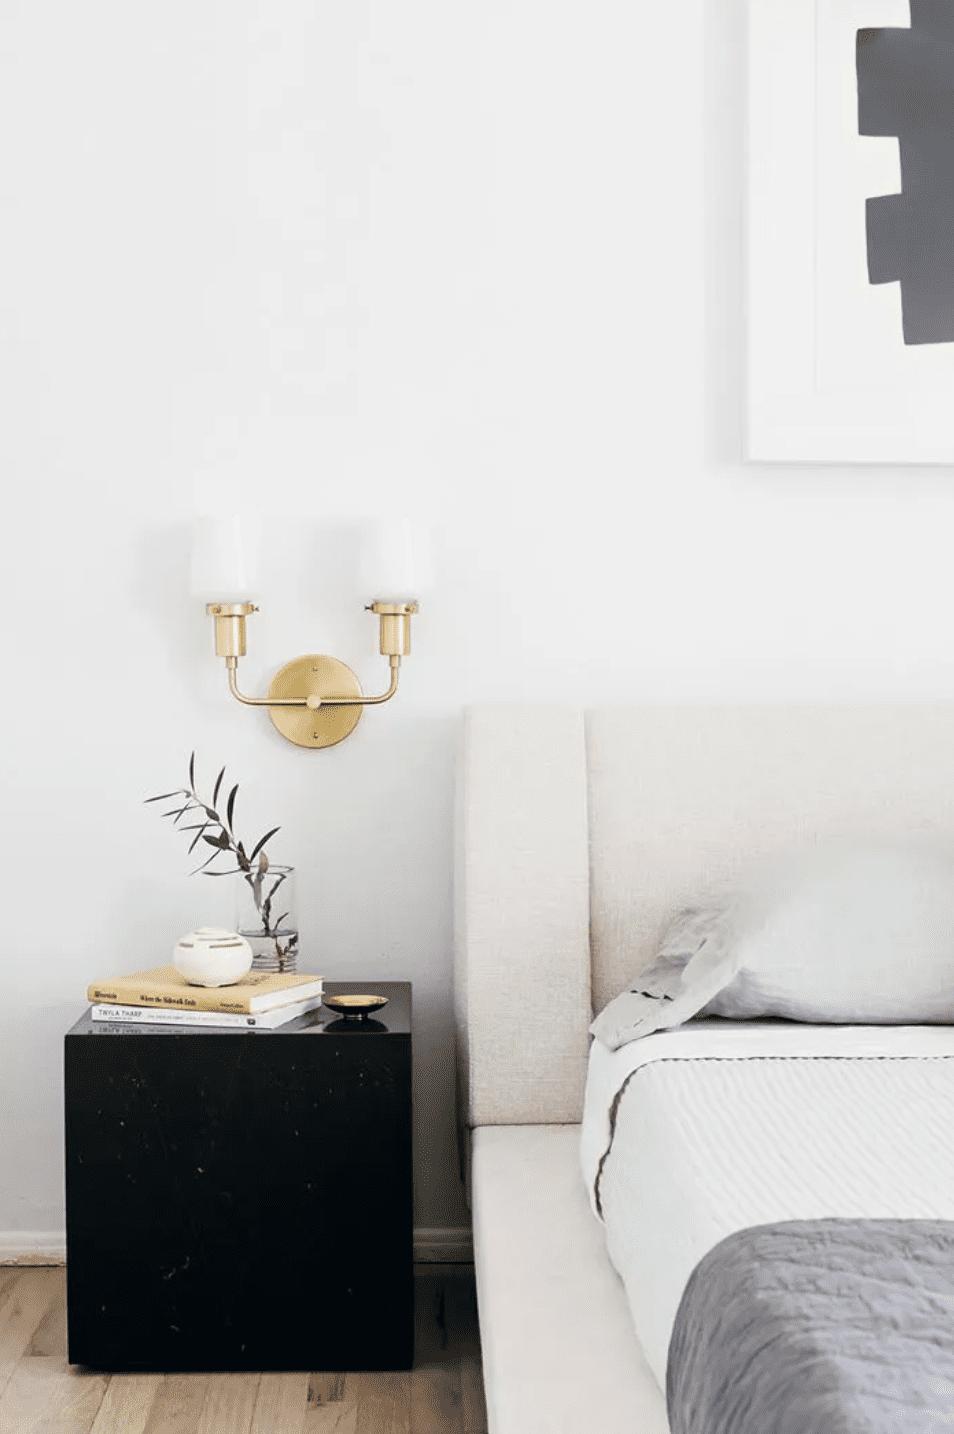 Calm bedroom balances colors and textures